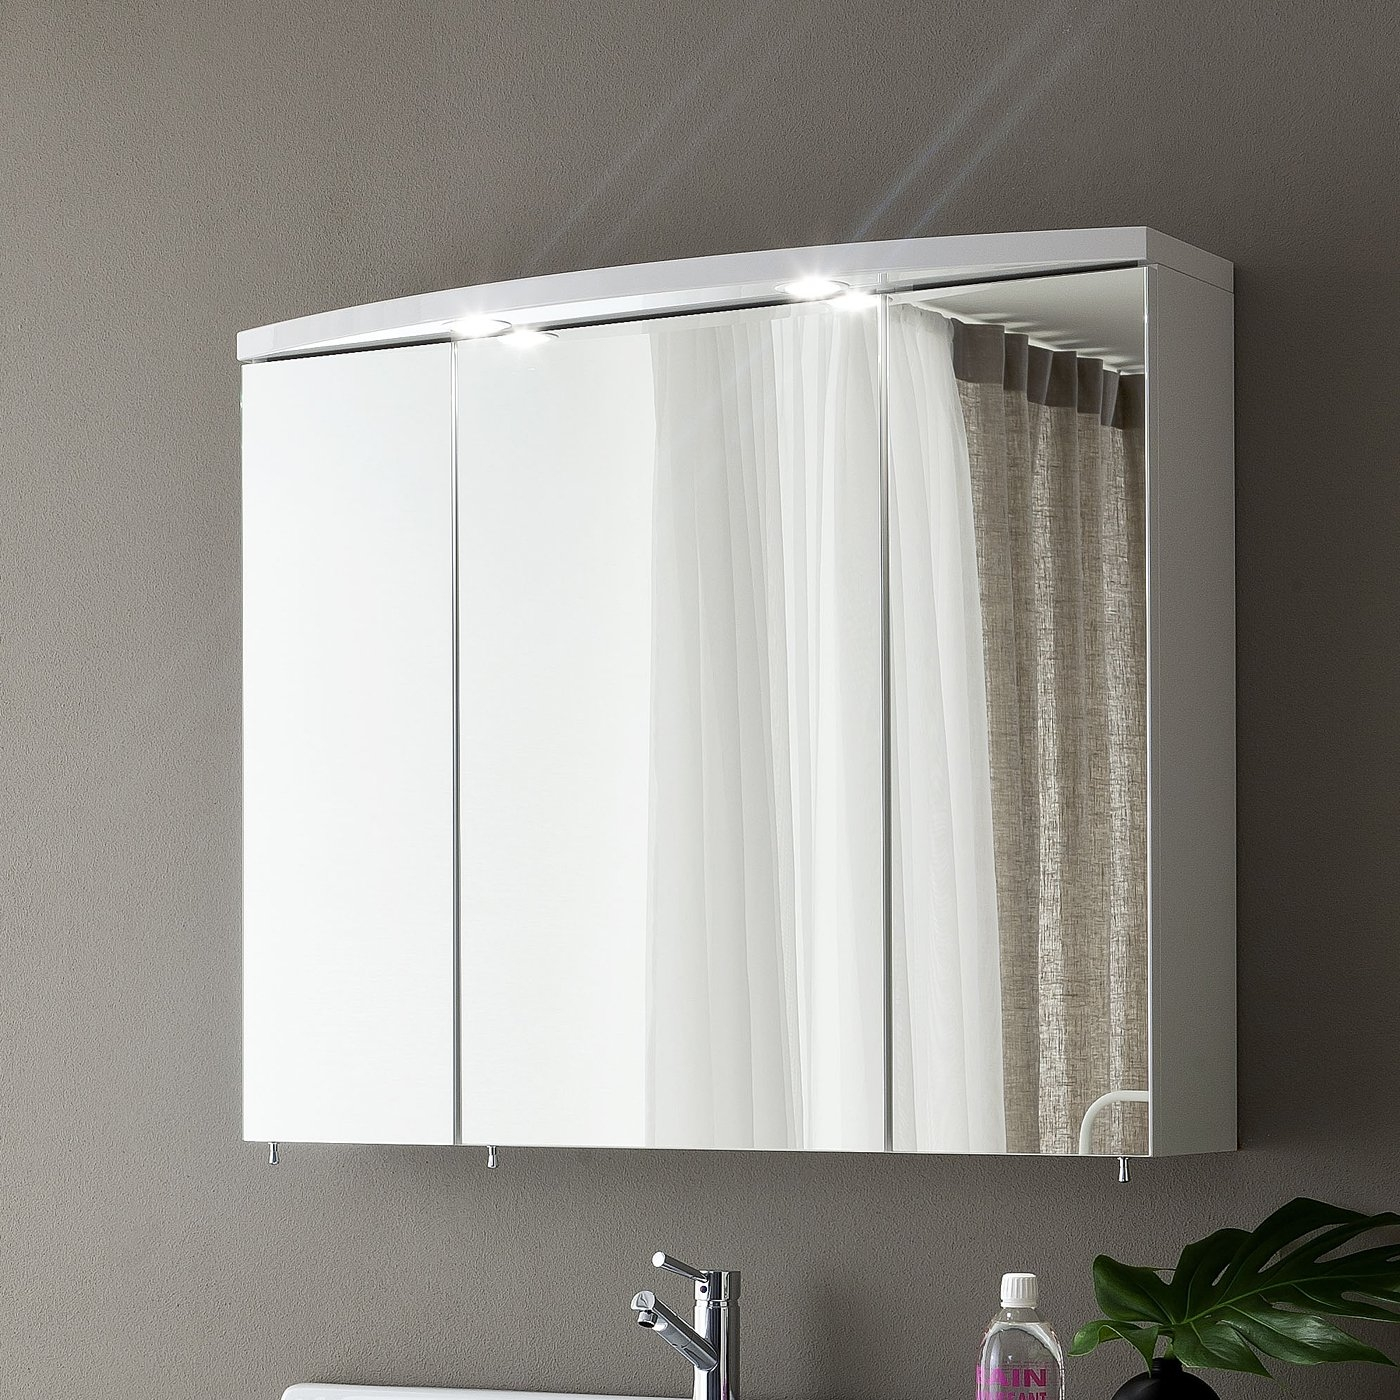 Triple Mirrored Bathroom Wall Cabinet